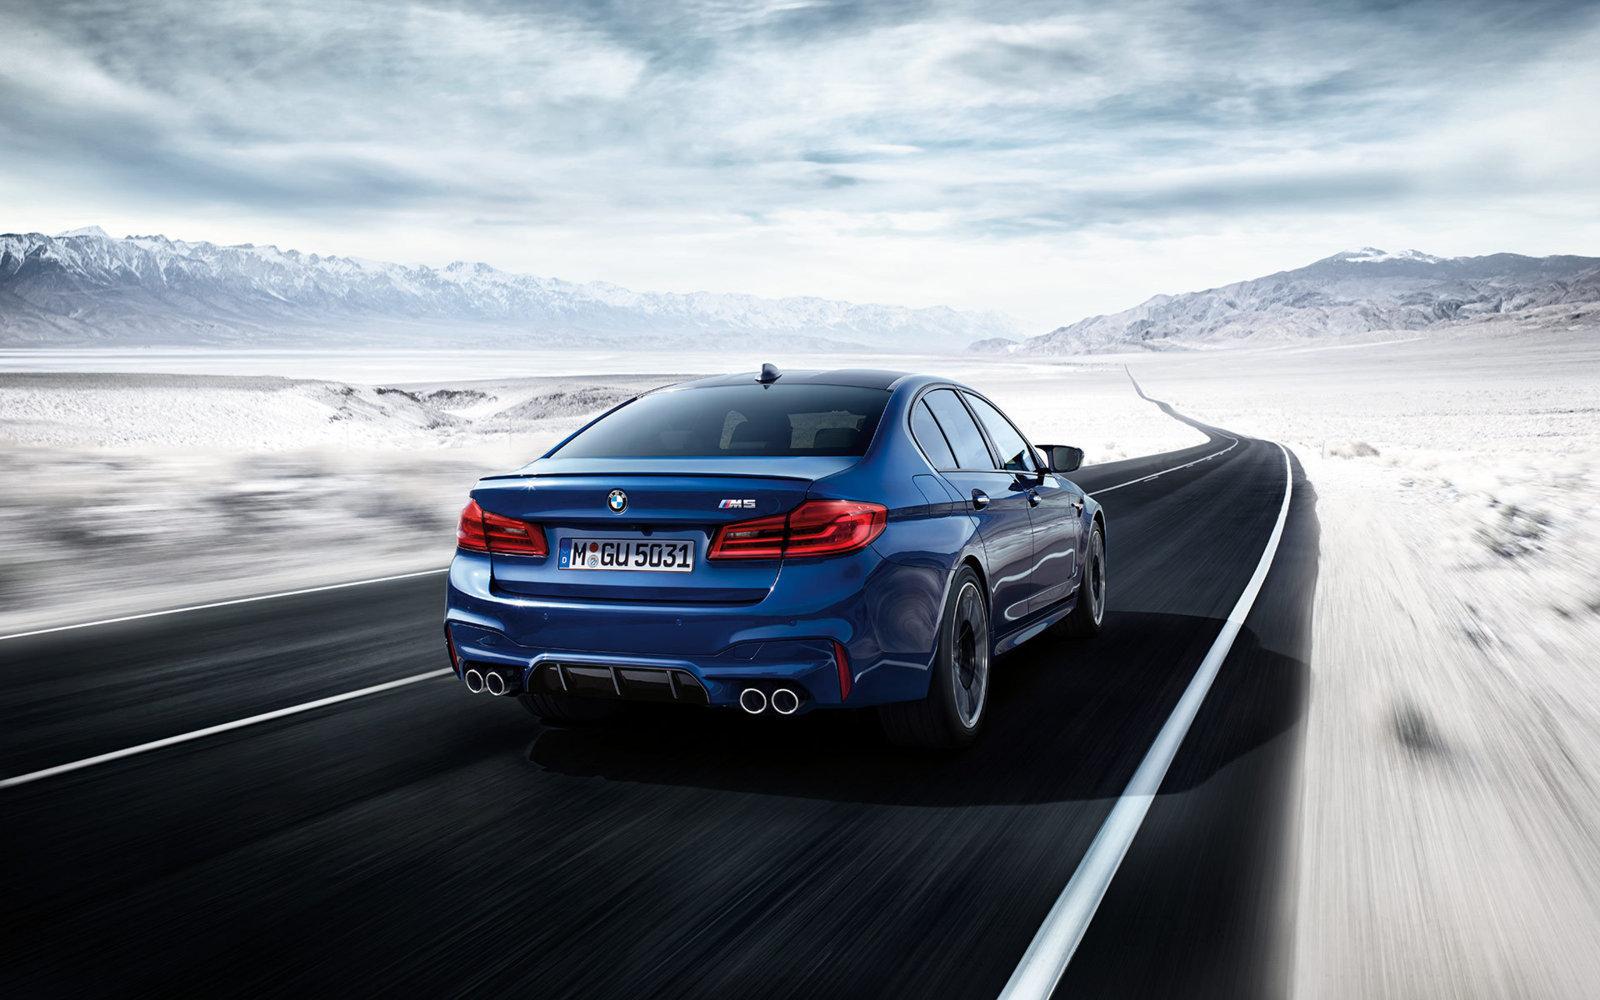 BMW-M5-2018-Wallpaper-7.jpg